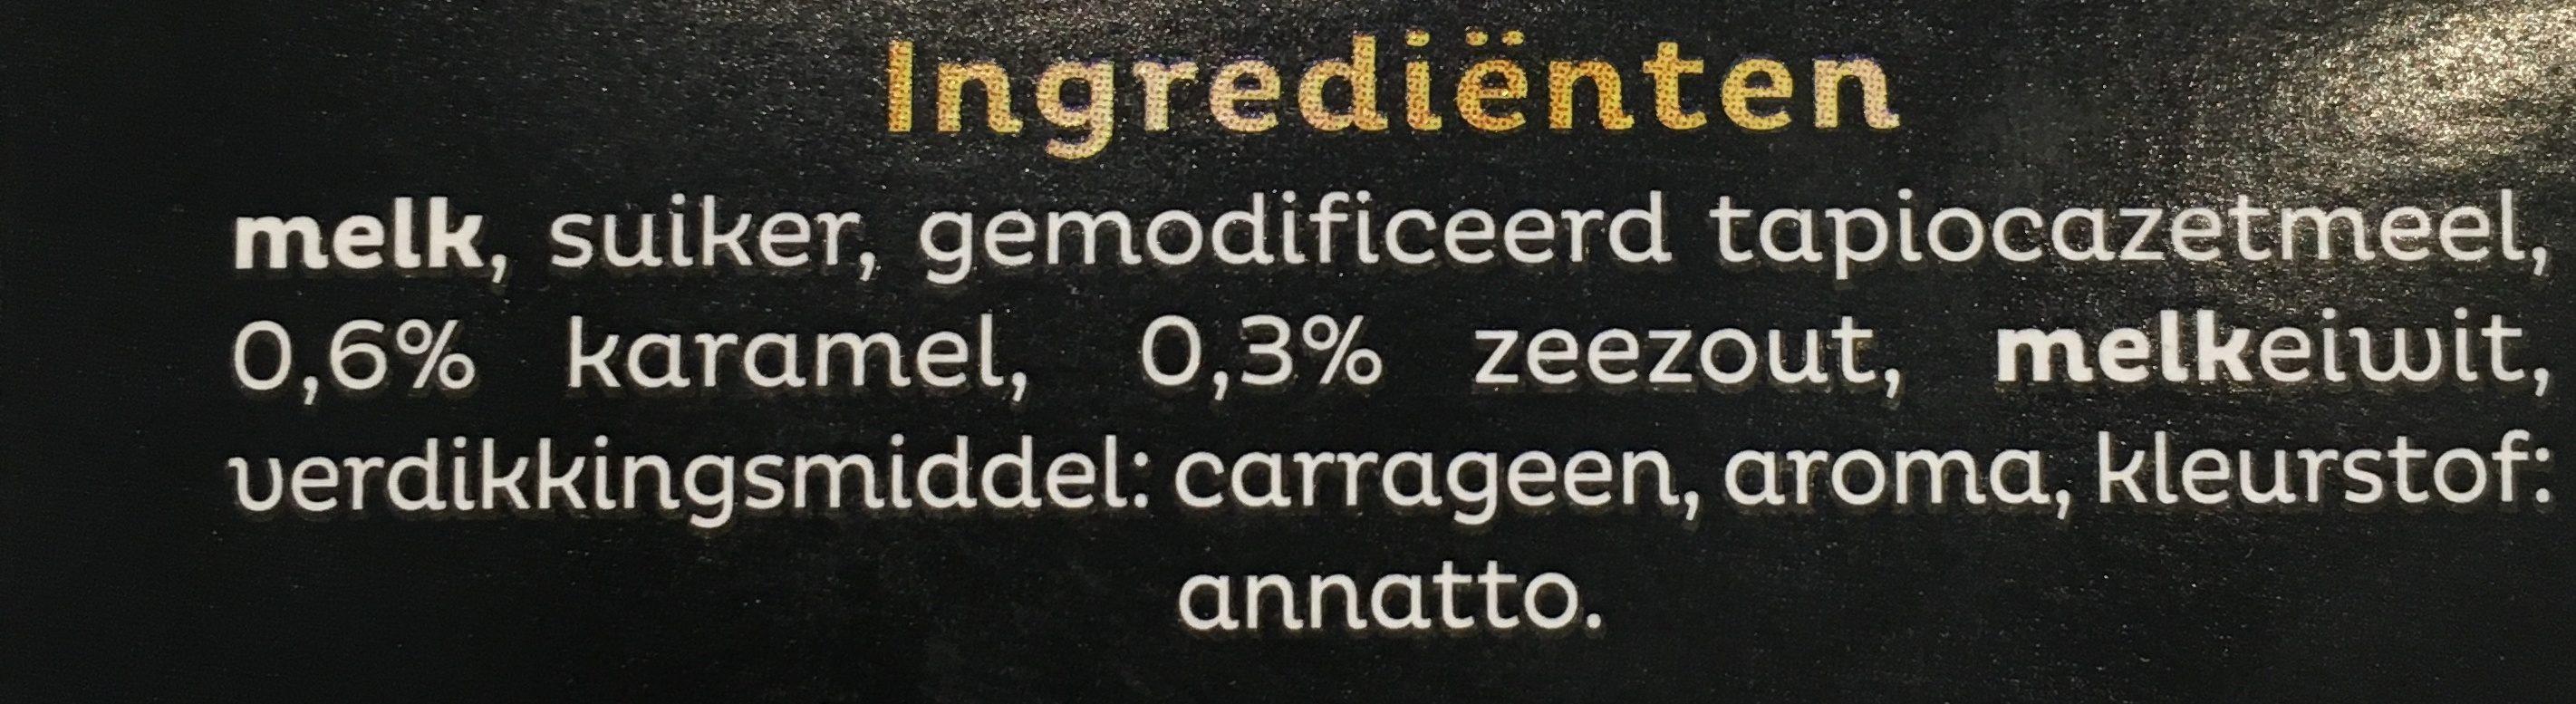 Vla Intense Karamel Zeezout - Ingrediënten - fr